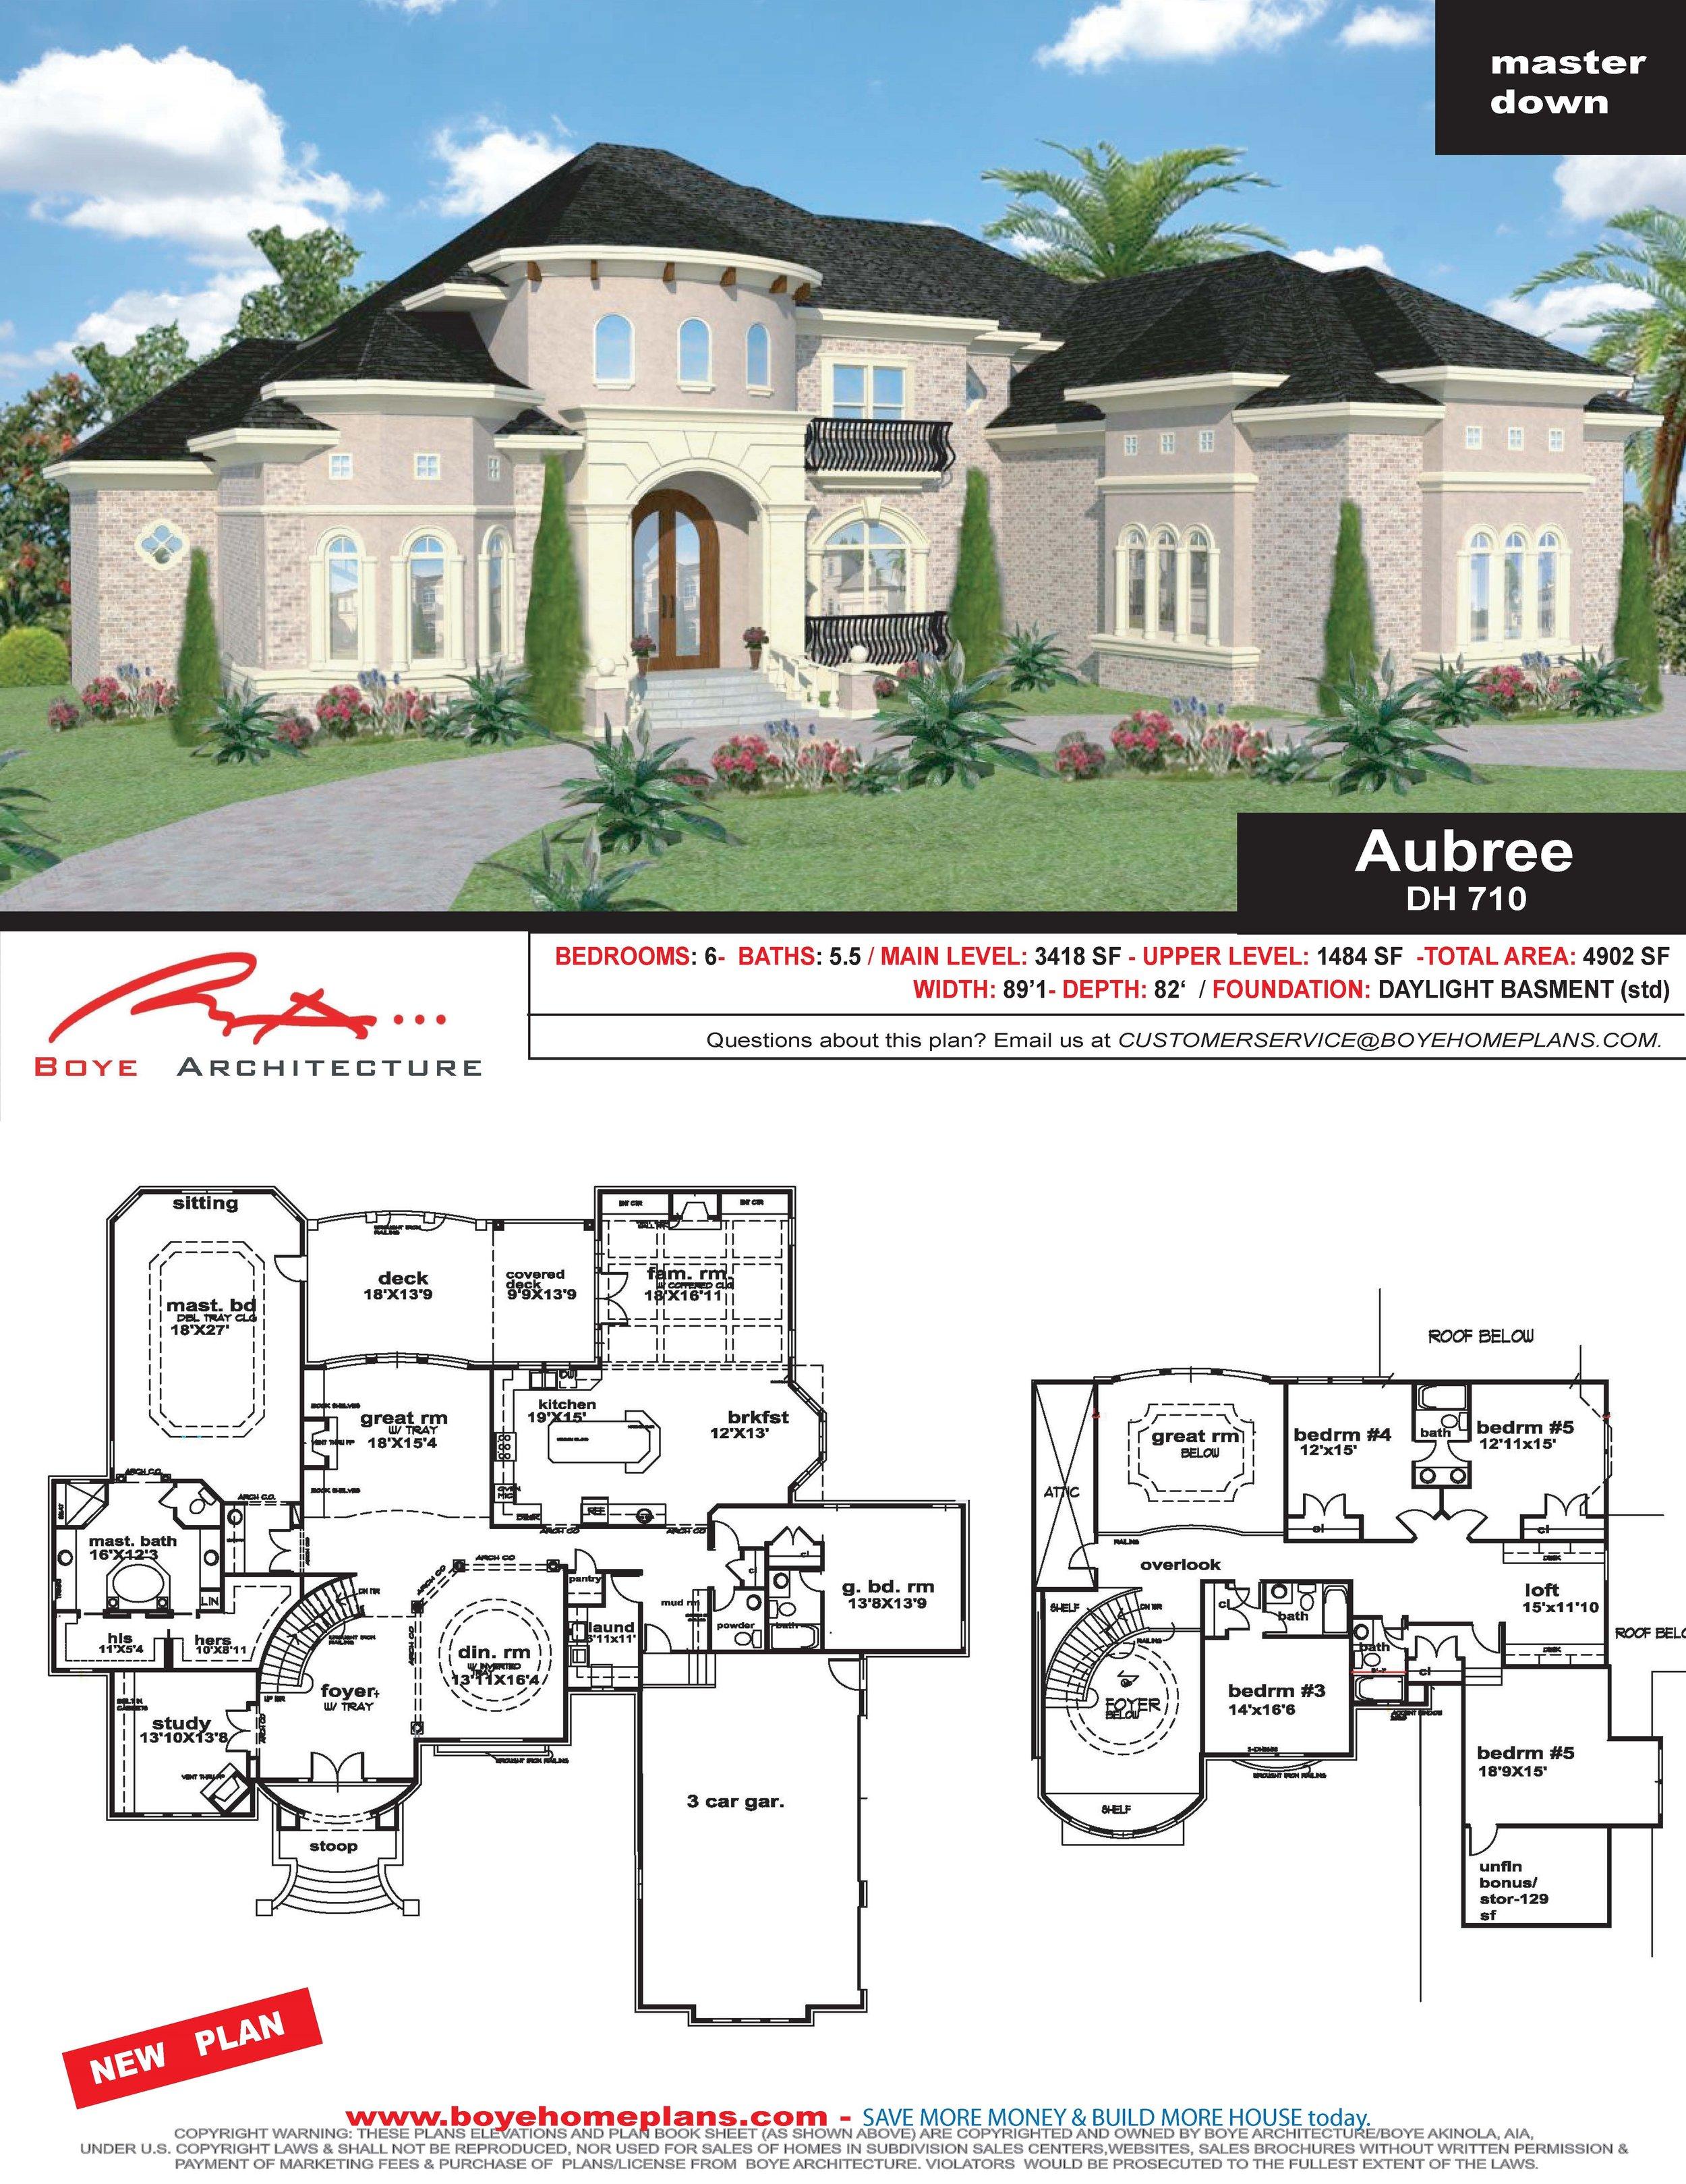 AUBREE PLAN PAGE-DH710-030417.jpg